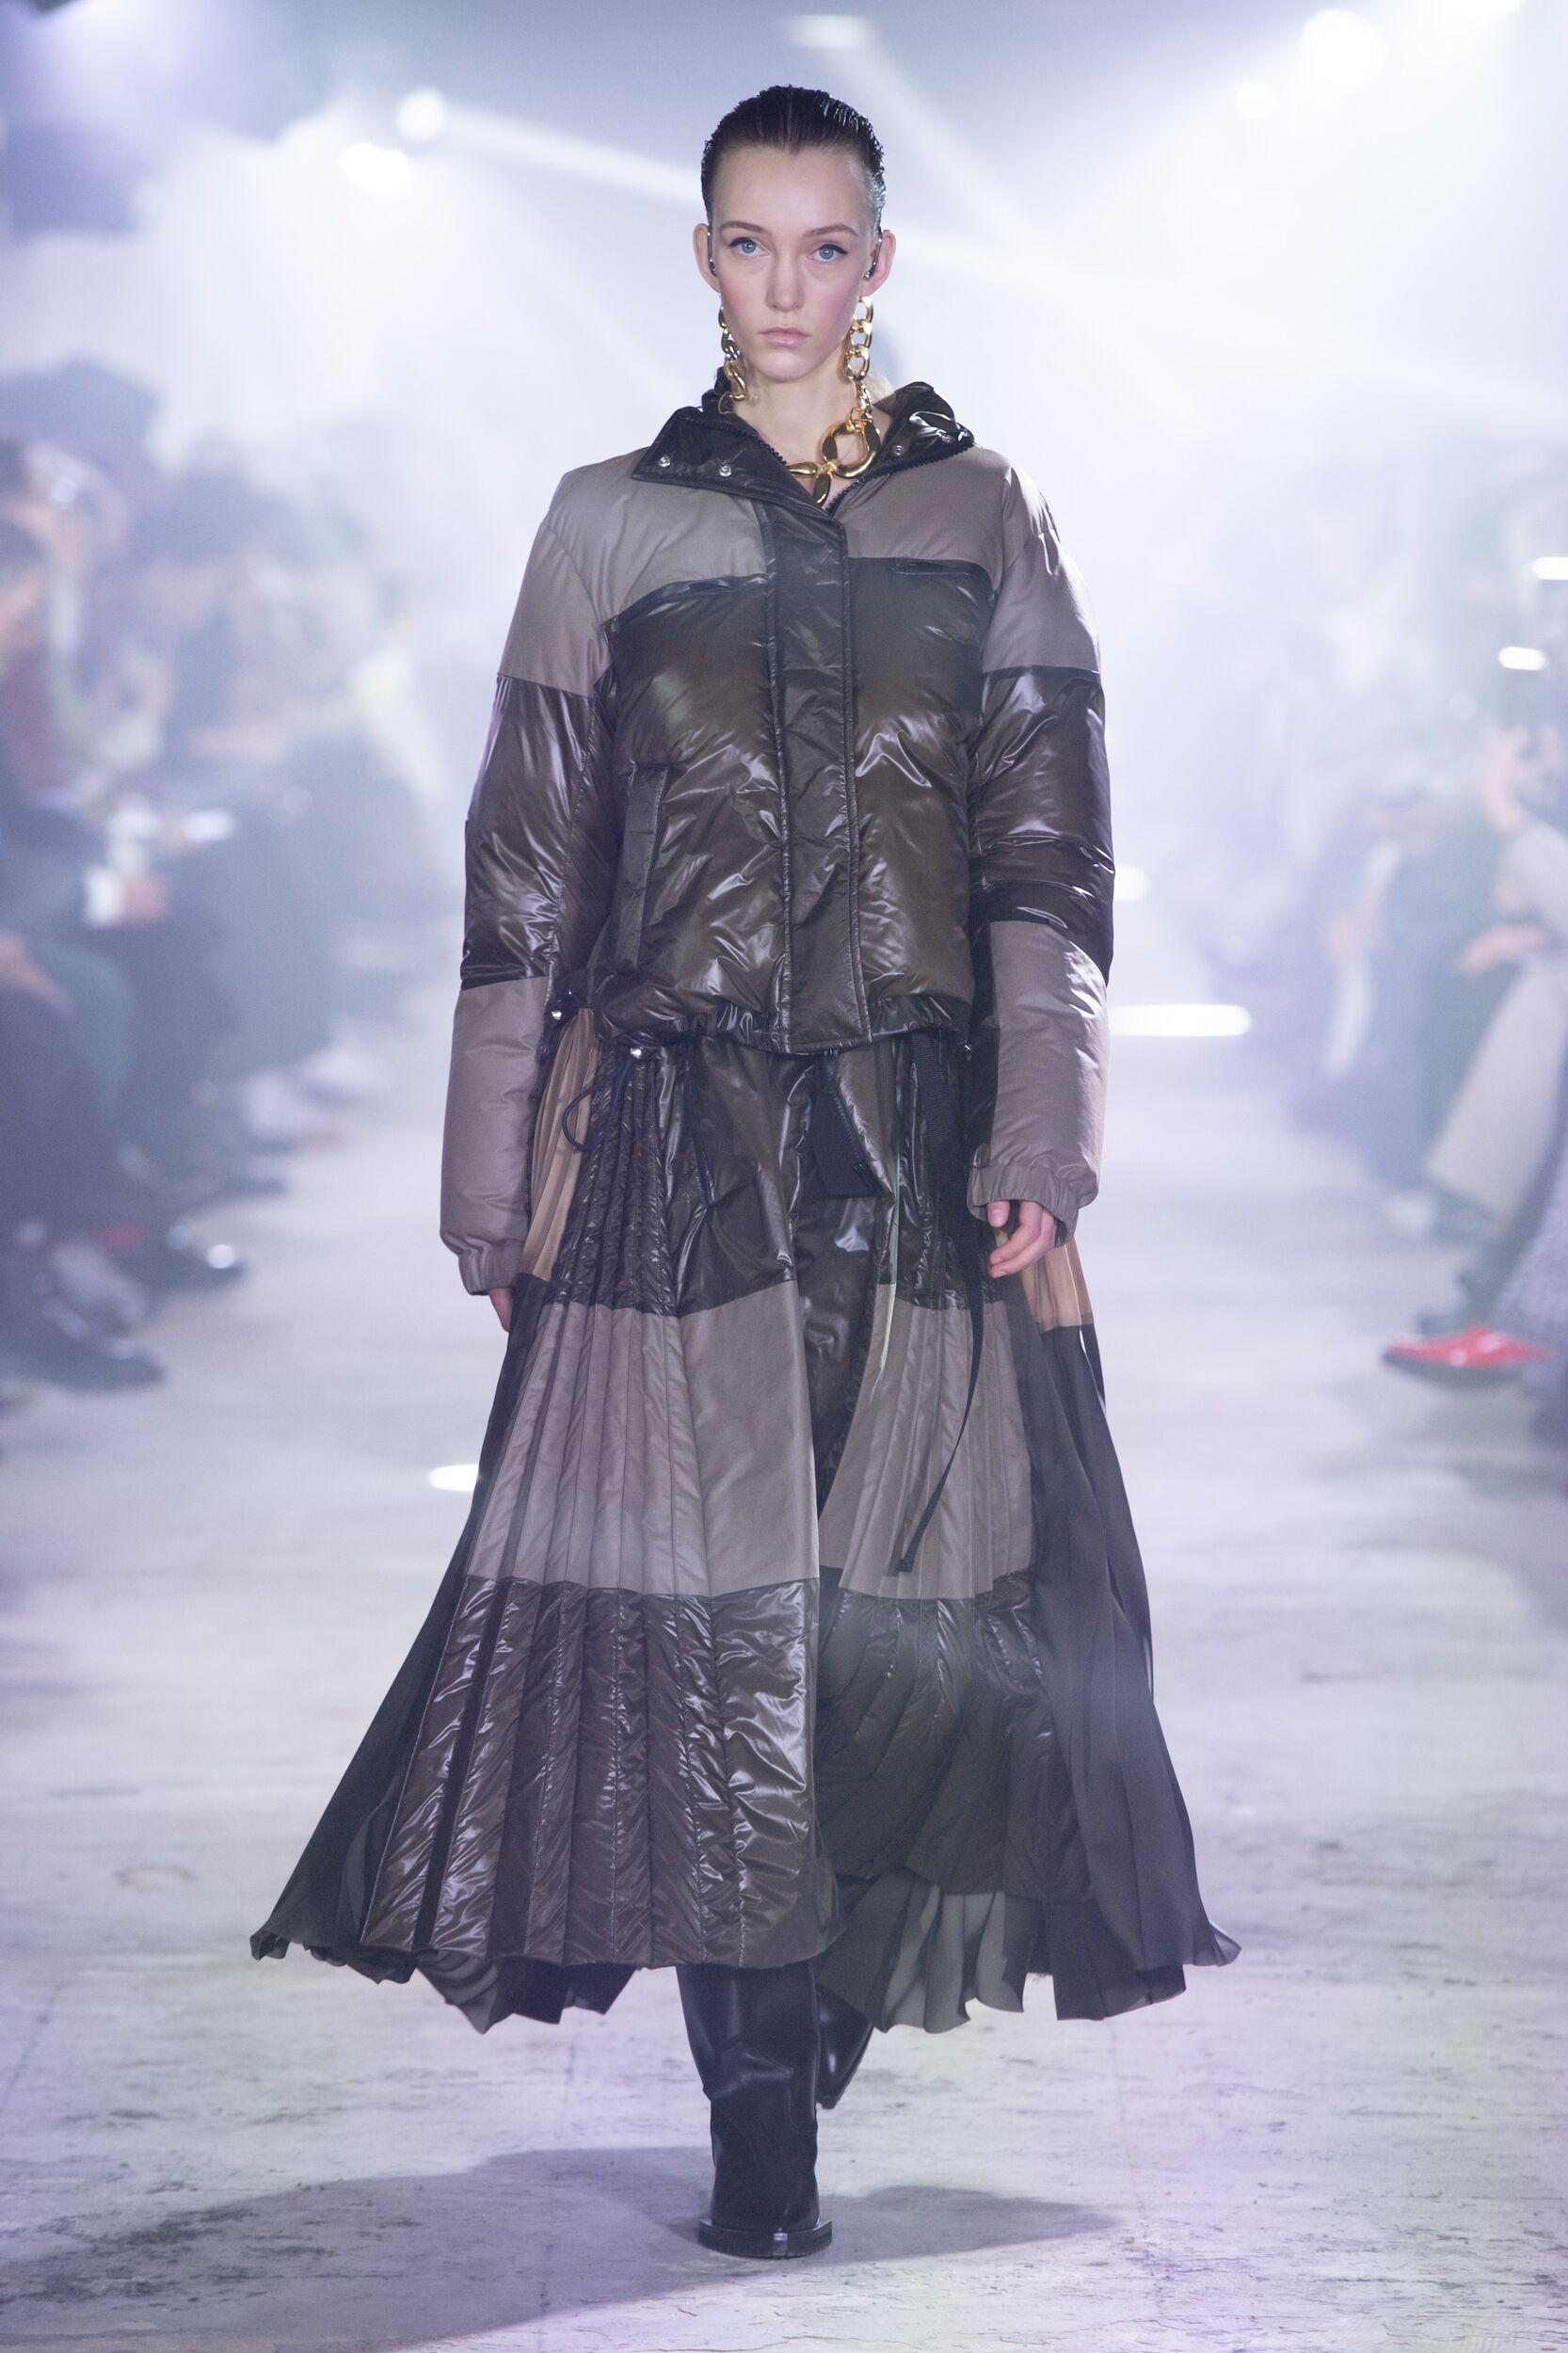 Fashion Model Sacai Catwalk